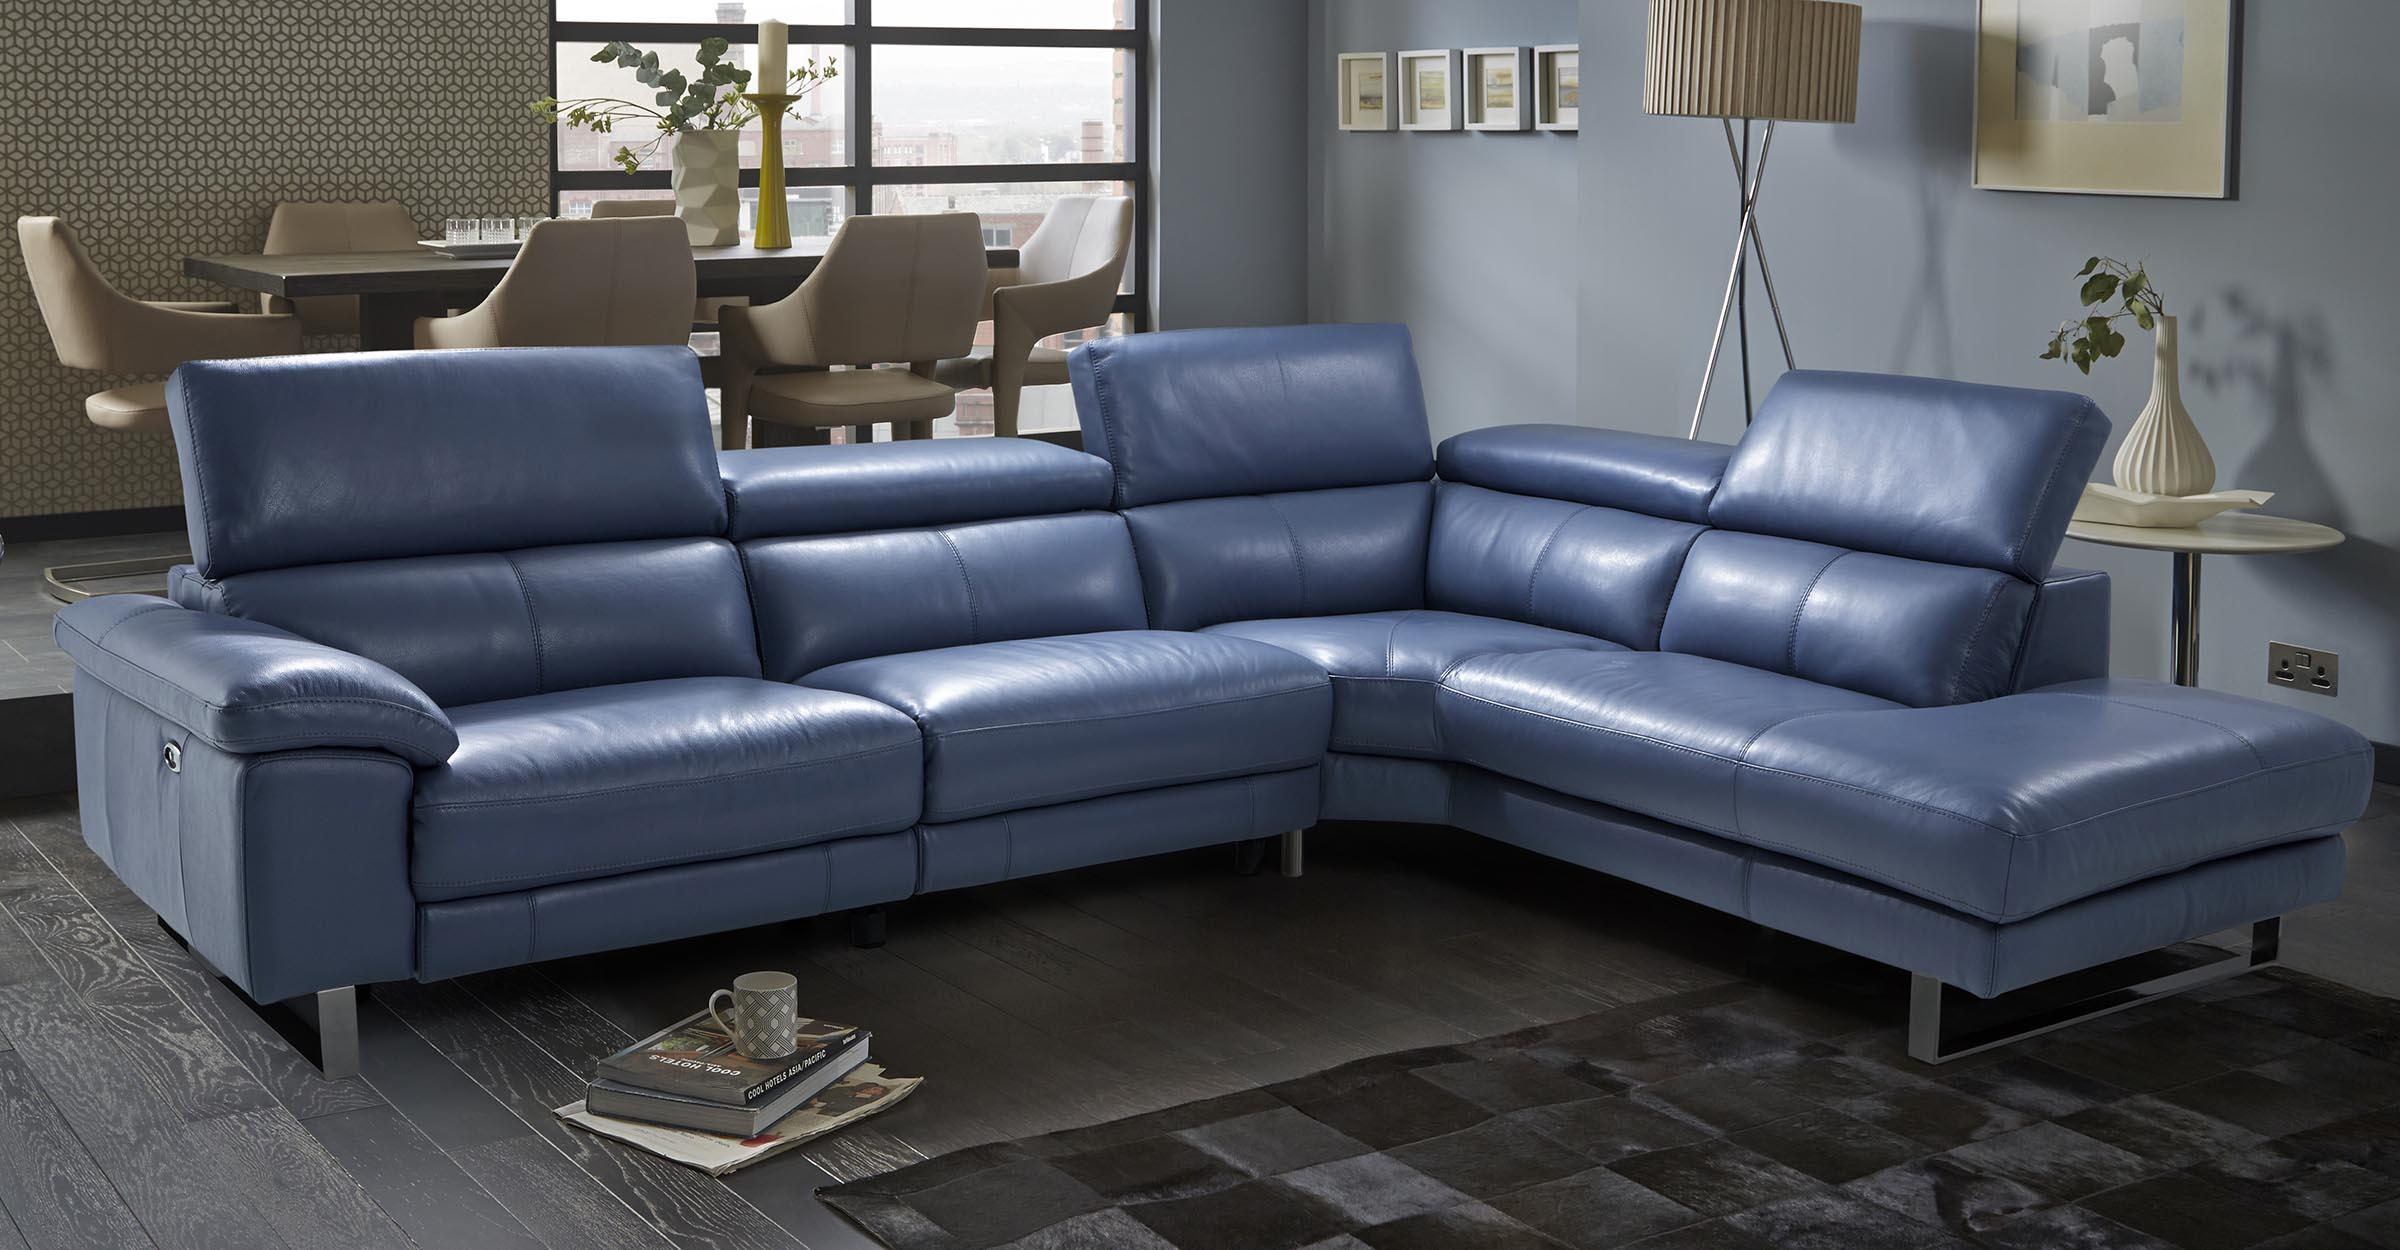 Contemporary and Modern Sofas | DFS